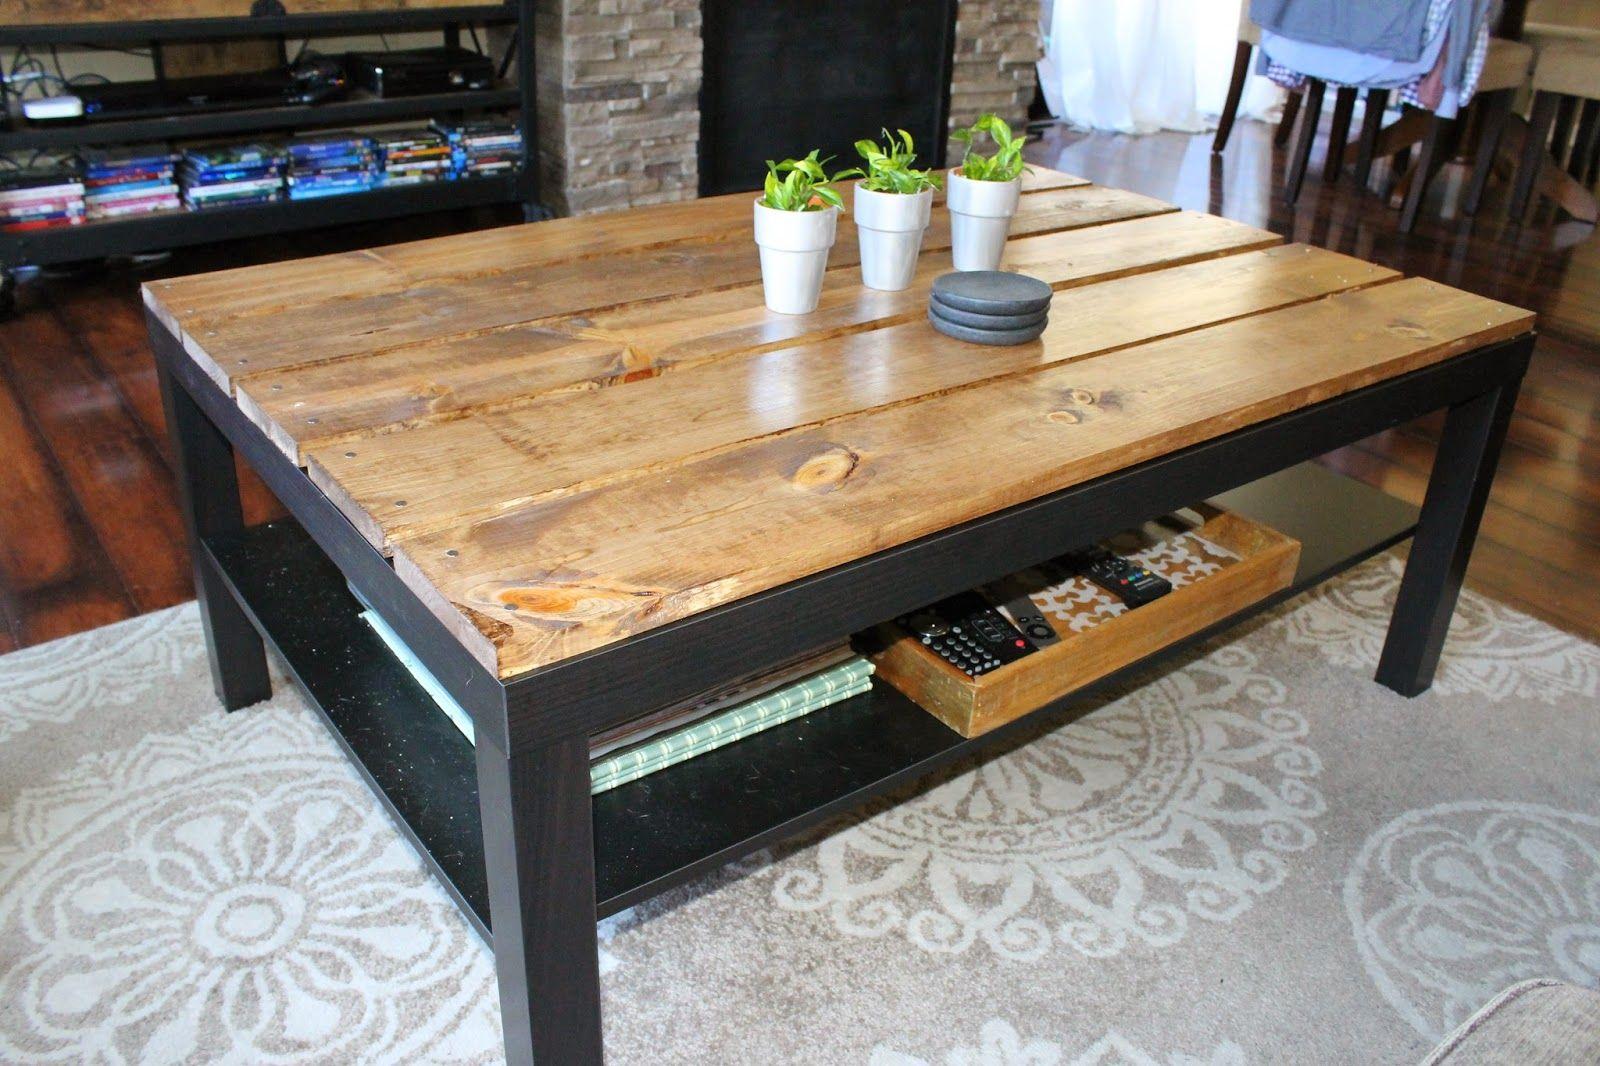 Ikea Coffee Table Hackwe Bought The Lack Ikea Coffee Table